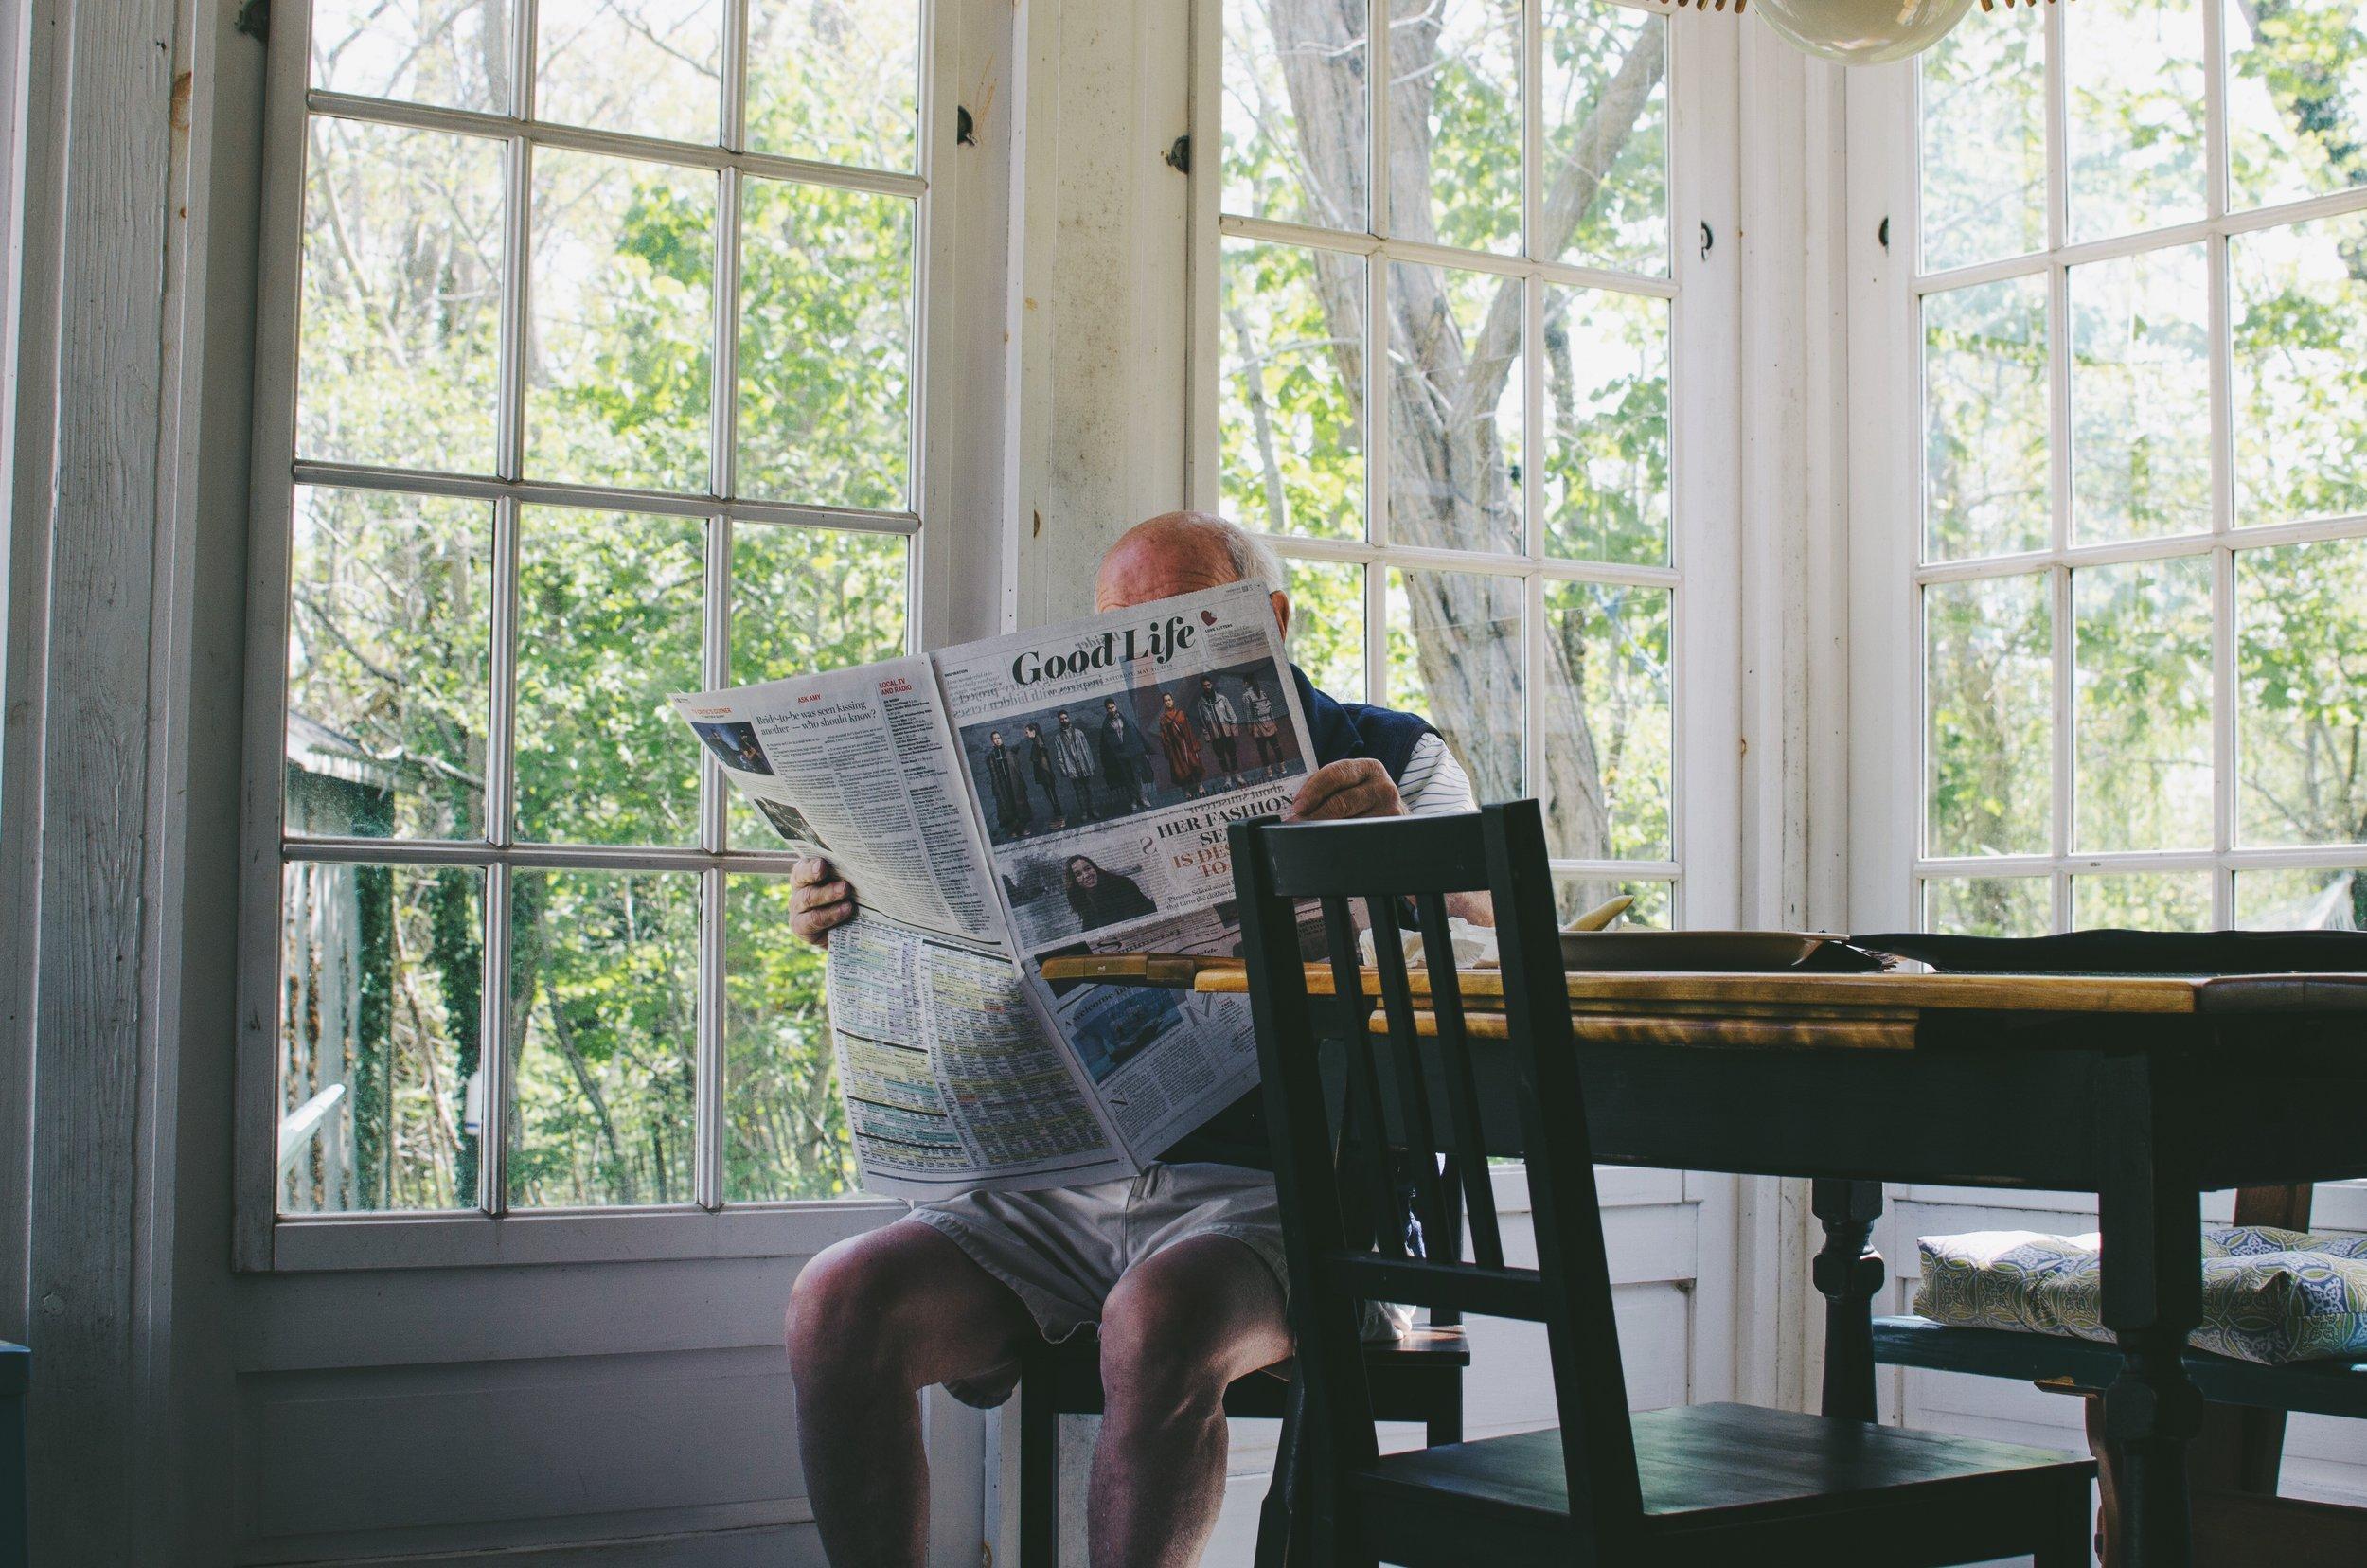 negative-space-old-man-reading-newspaper-morning-sam-wheeler.jpg